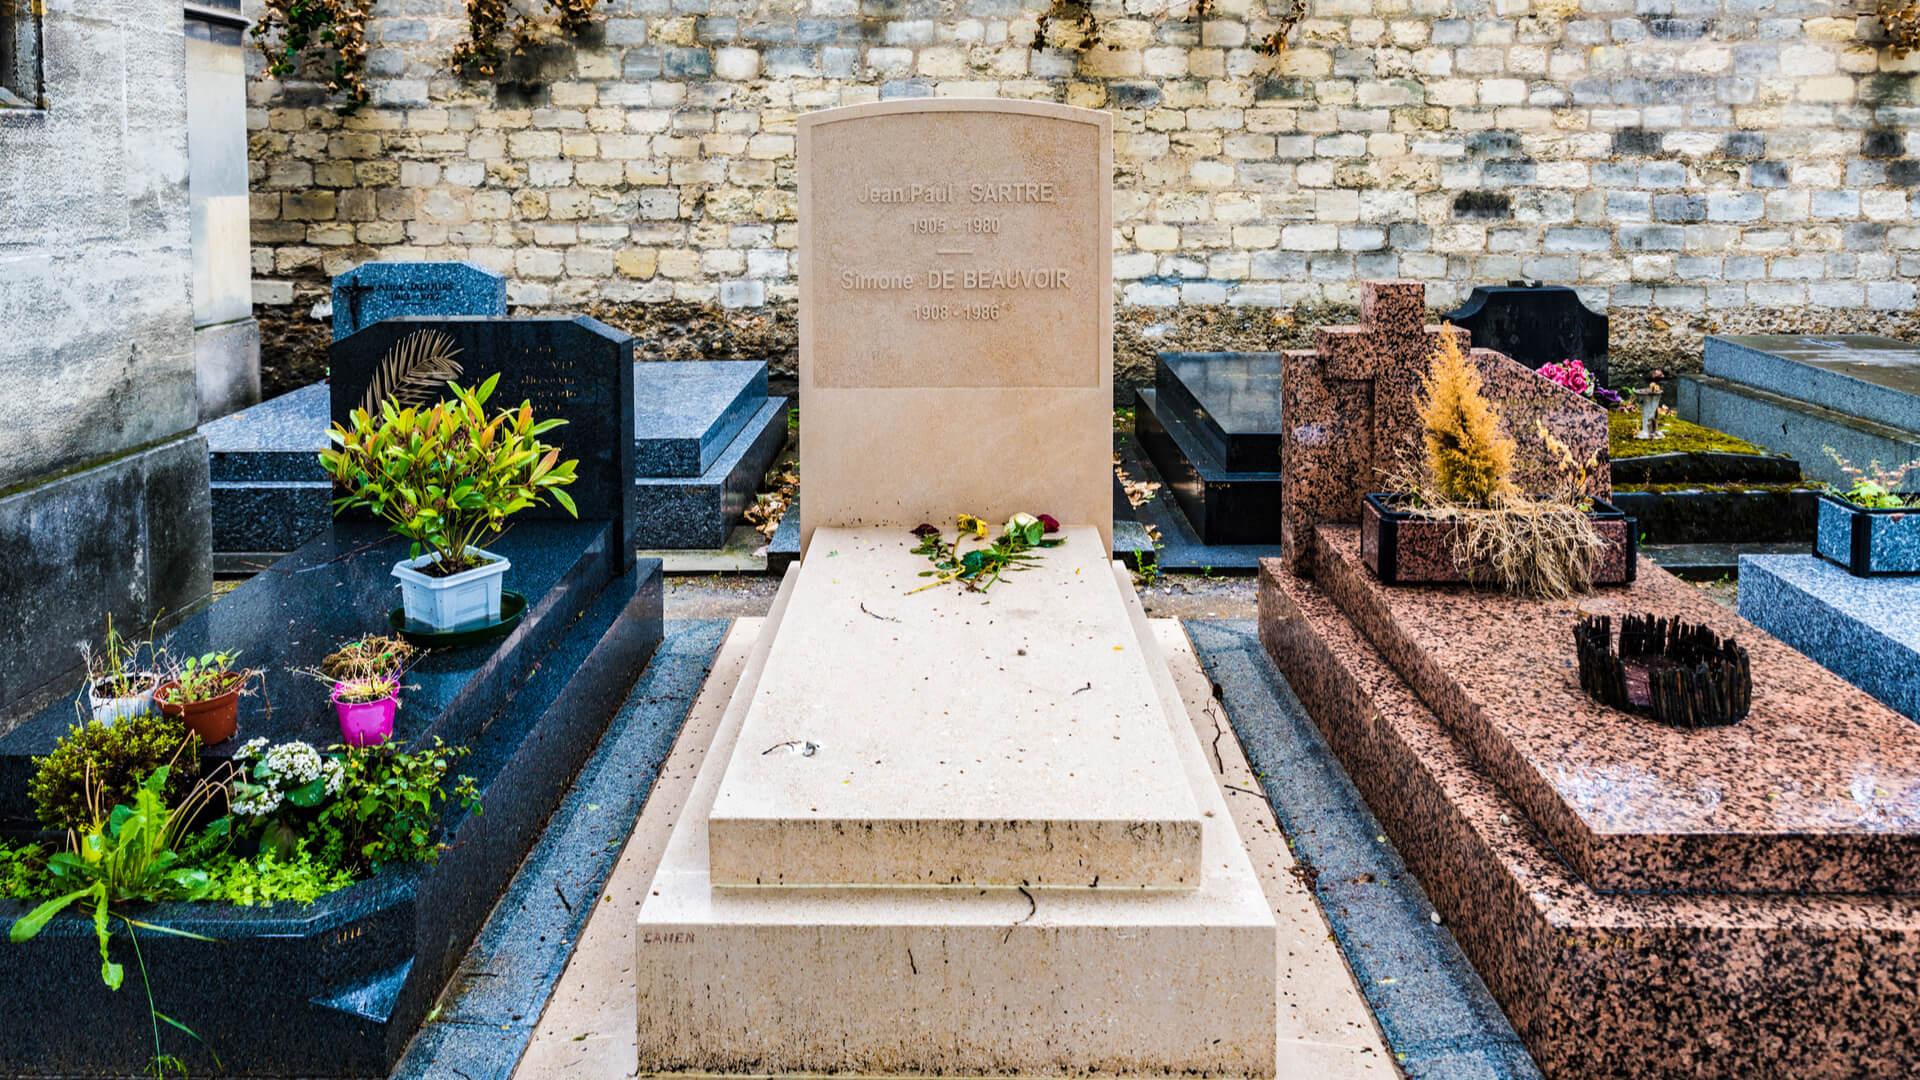 Tumbas de Sartre y Beauvoir, Cementerio de Montparnasse (París)